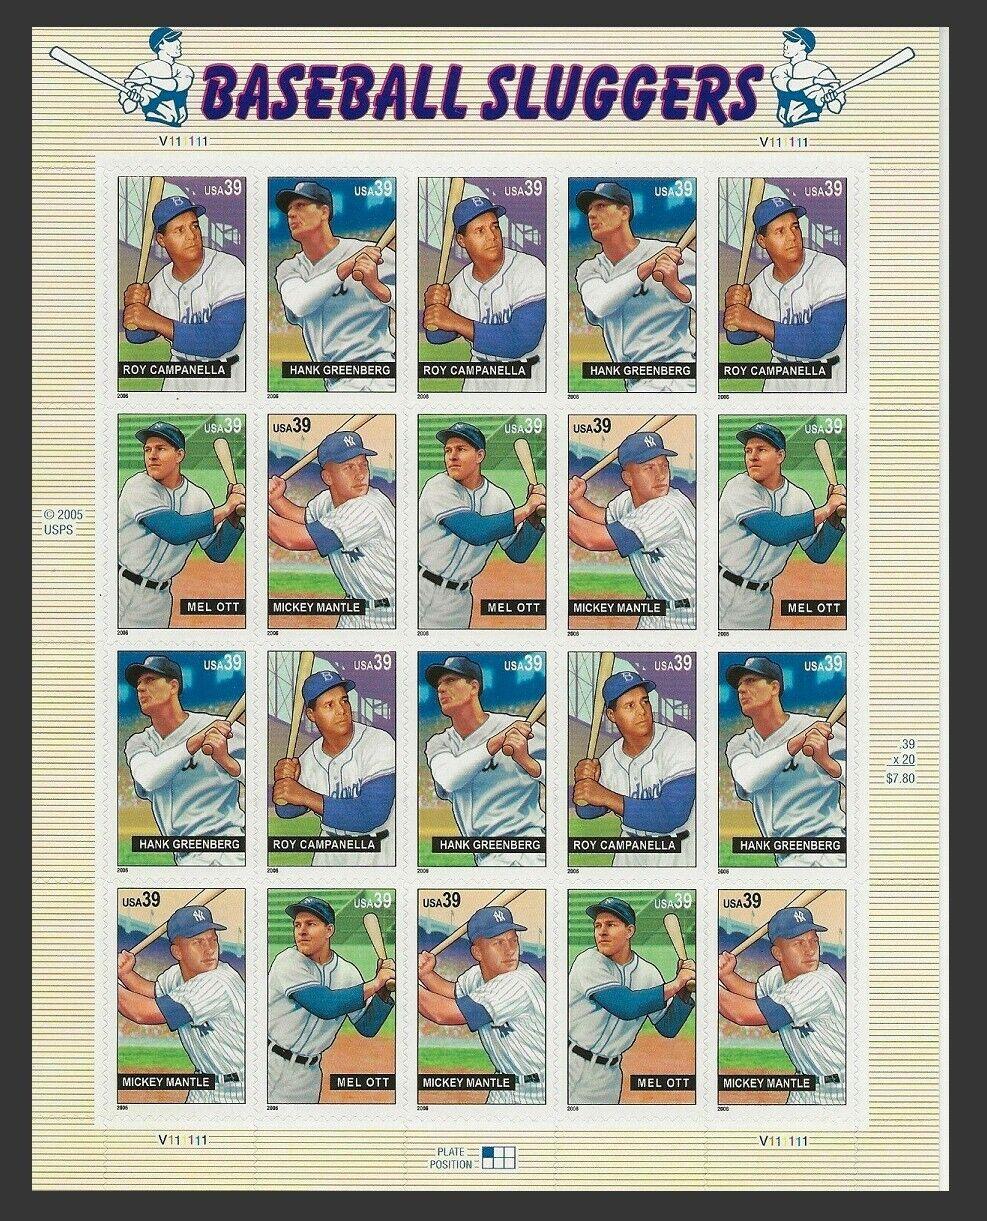 US Scott 4080/3 Baseball Sluggers Sheet Campanella, Greenberg, Mantle, Ott - $8.50